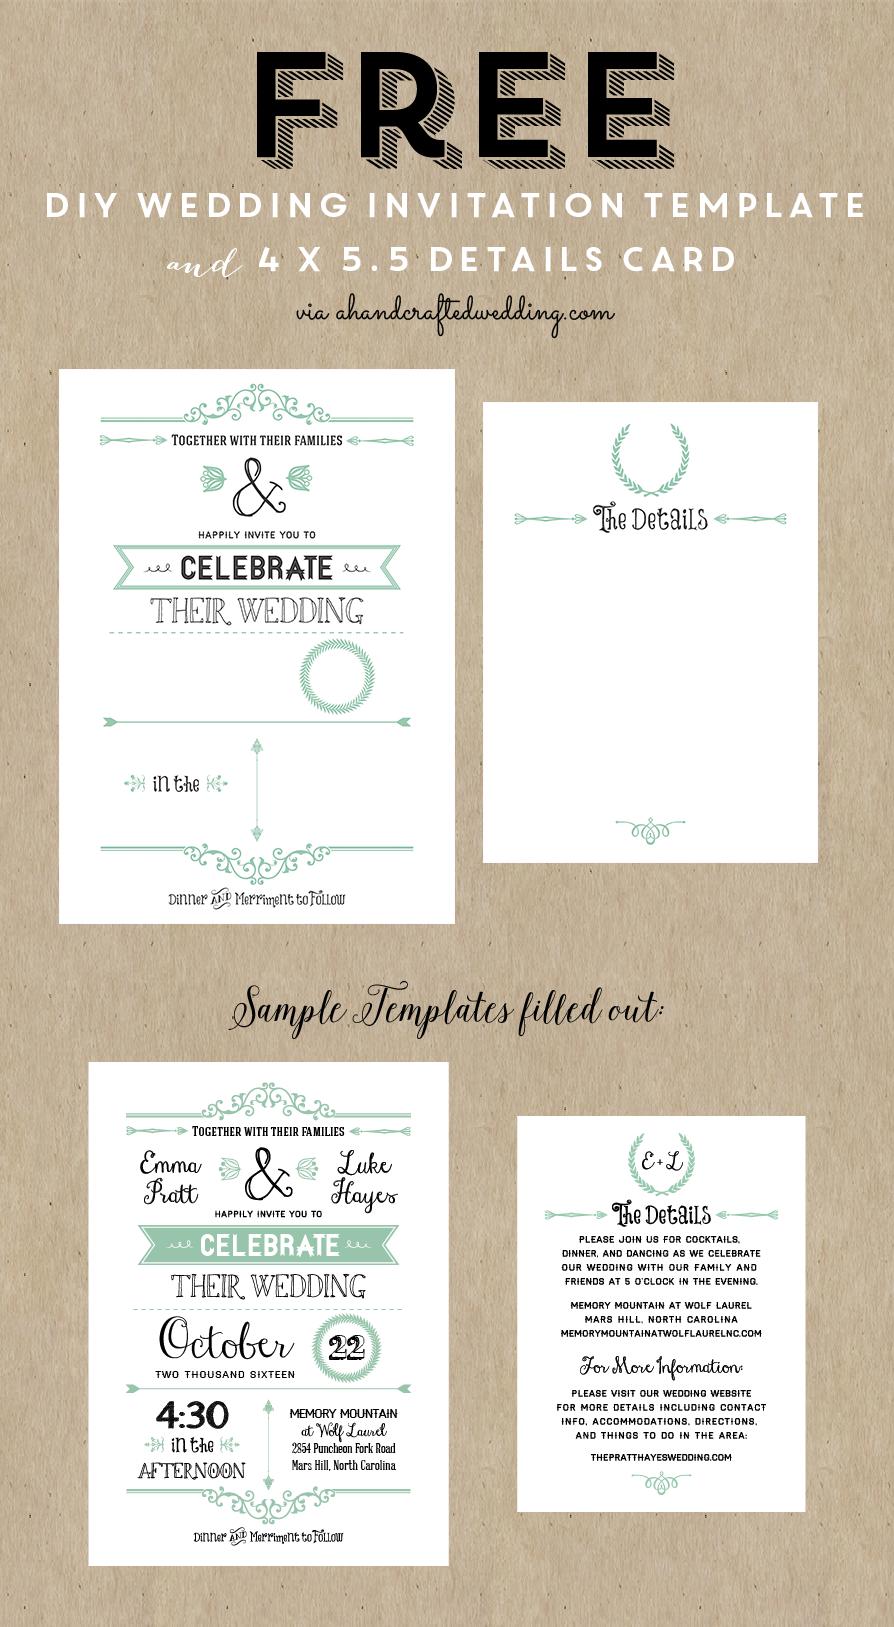 Free Printable Wedding Invitation Template | Wedding | Free Wedding - Free Printable Wedding Cards